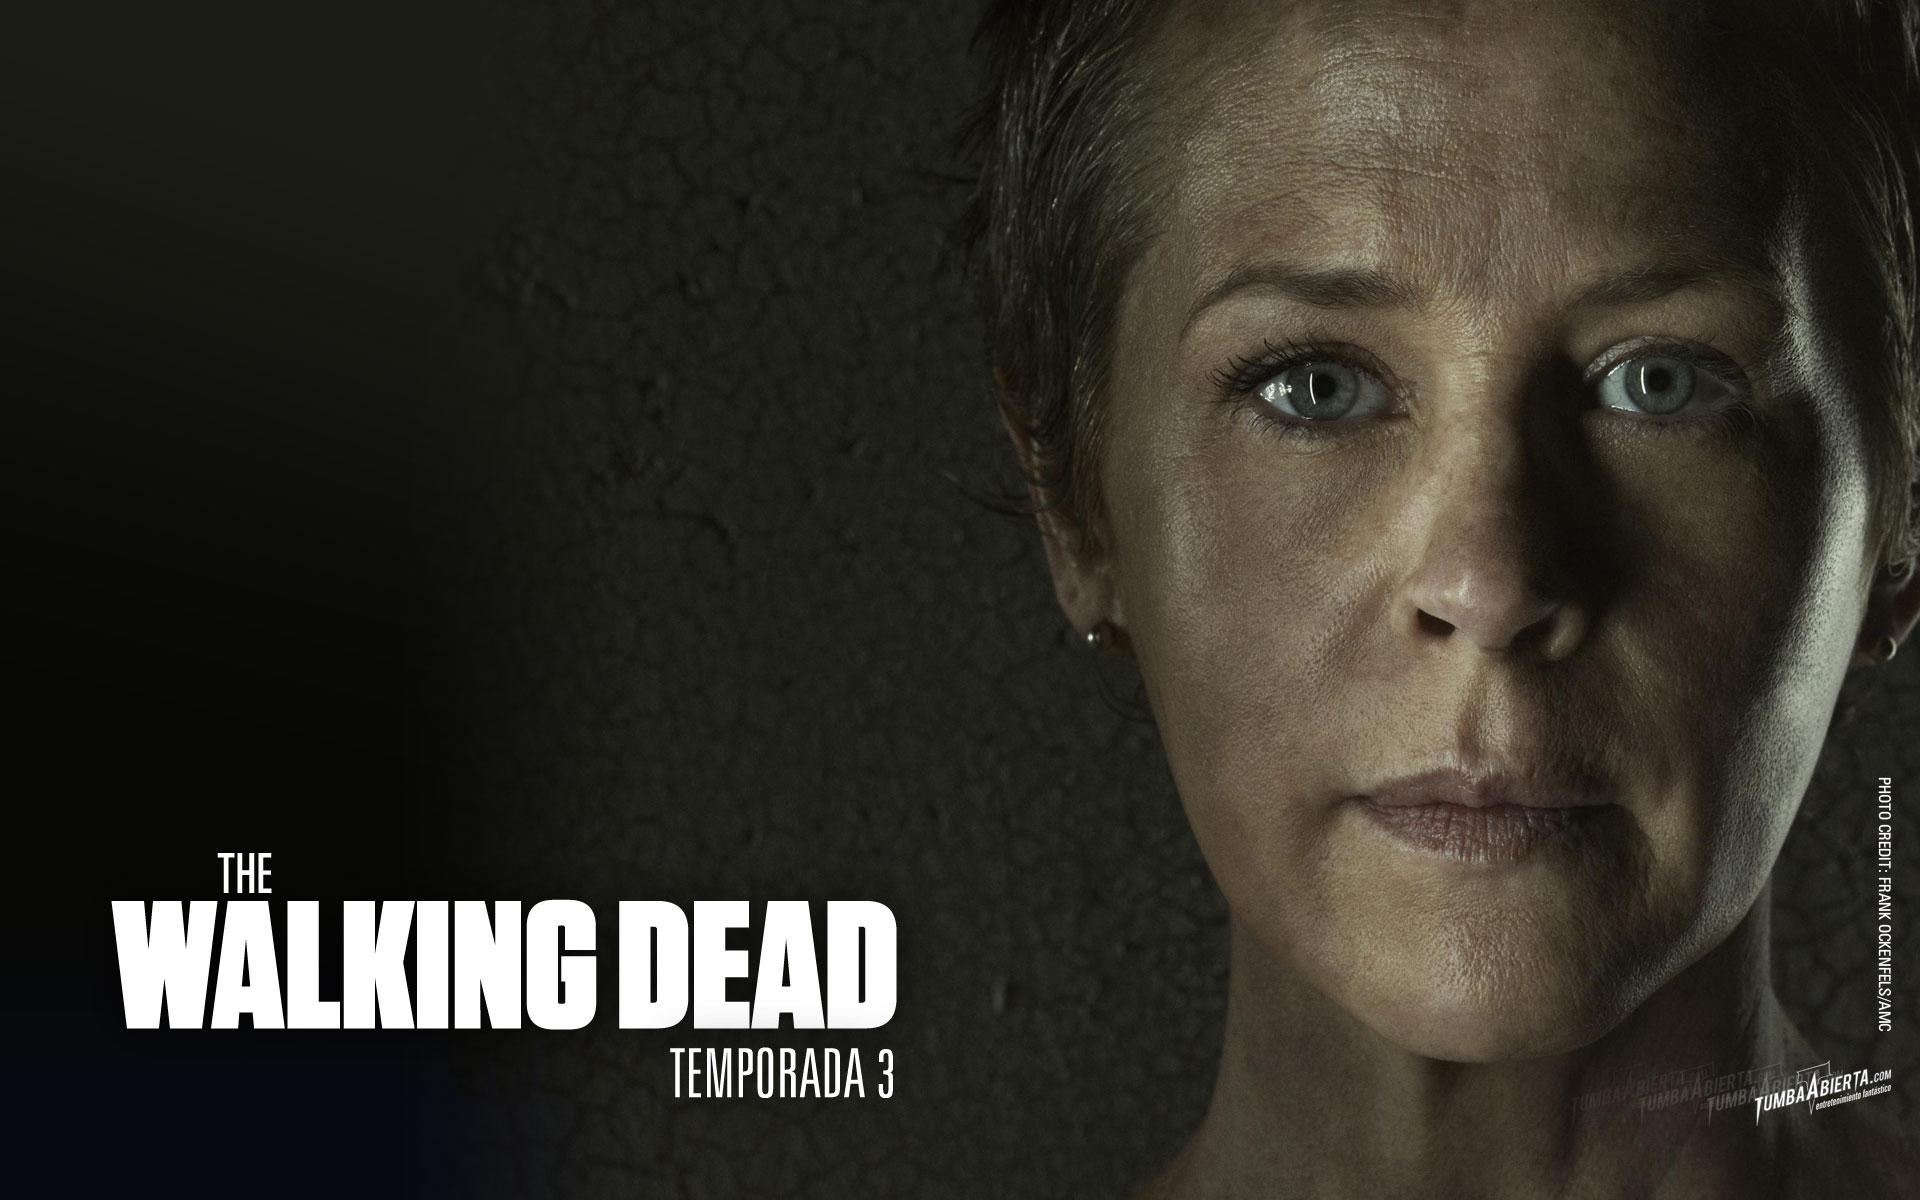 Wallpaper.- The walking dead temporada 3